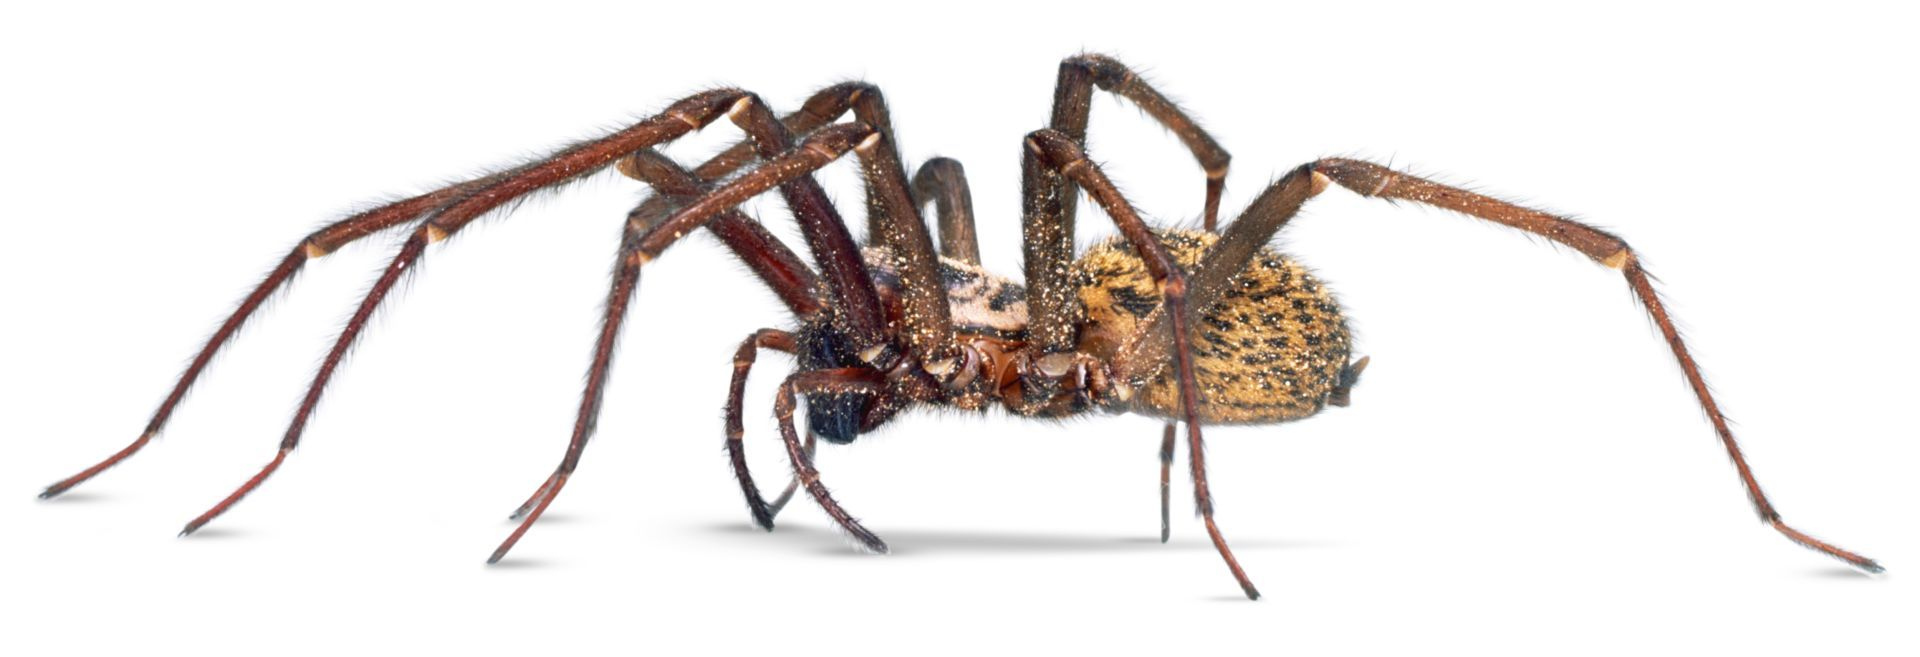 House Spiders Em 2020